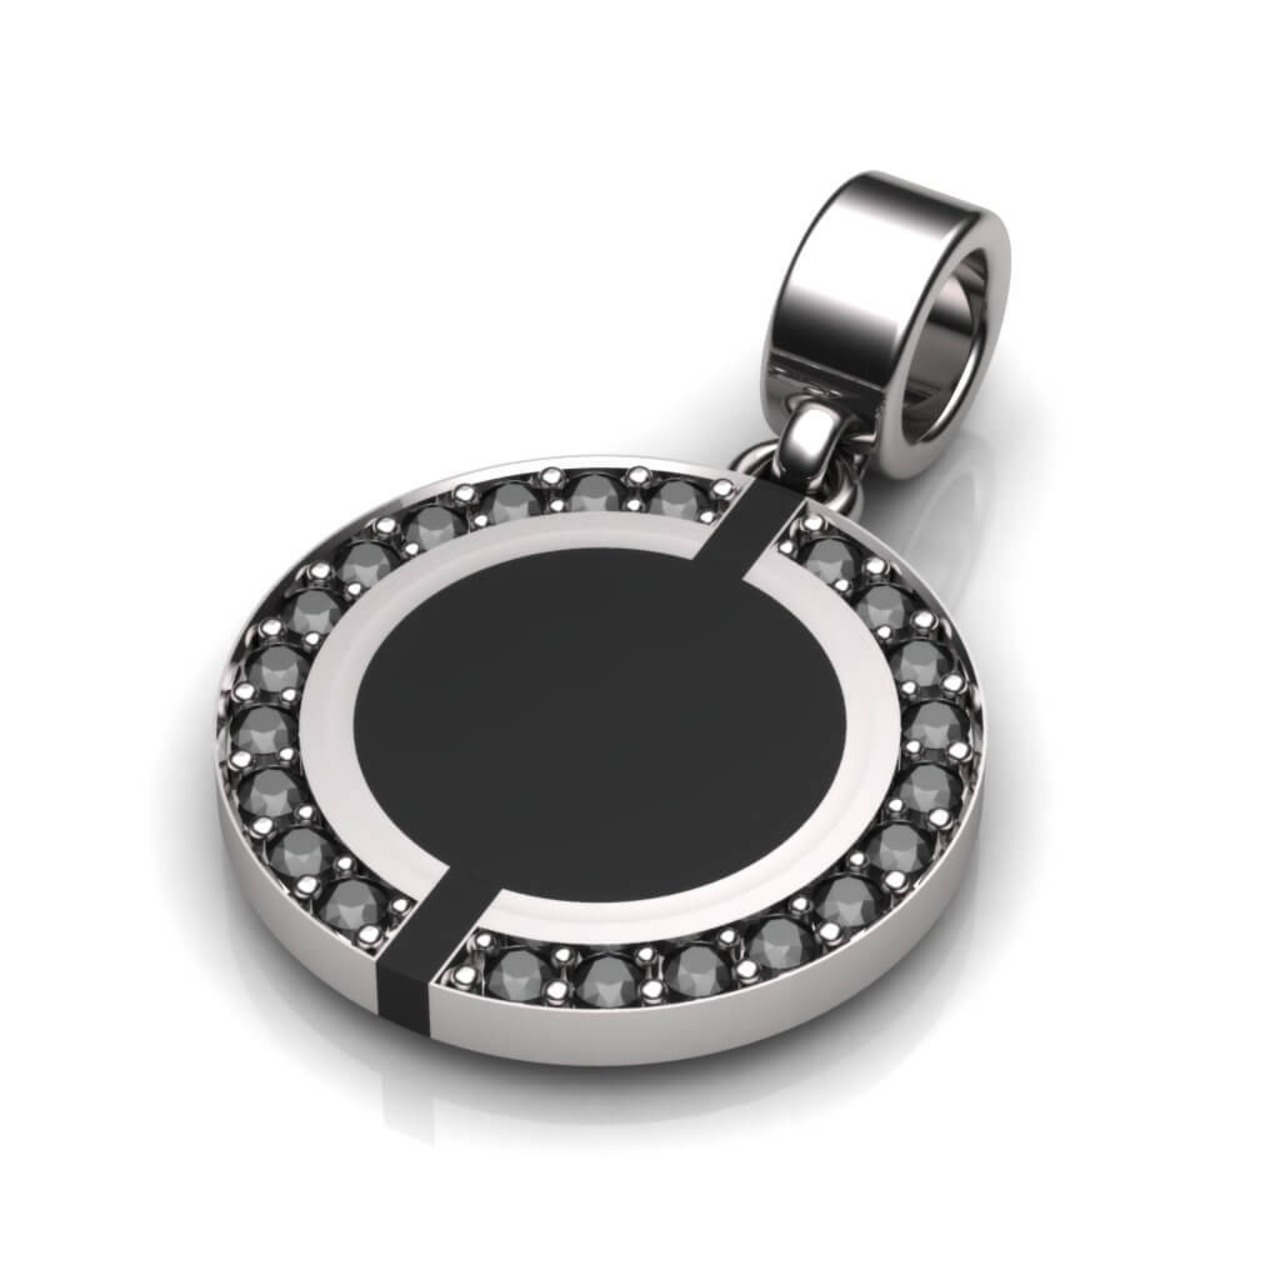 Kiroco NFC Crystal Enamel Disc Necklace